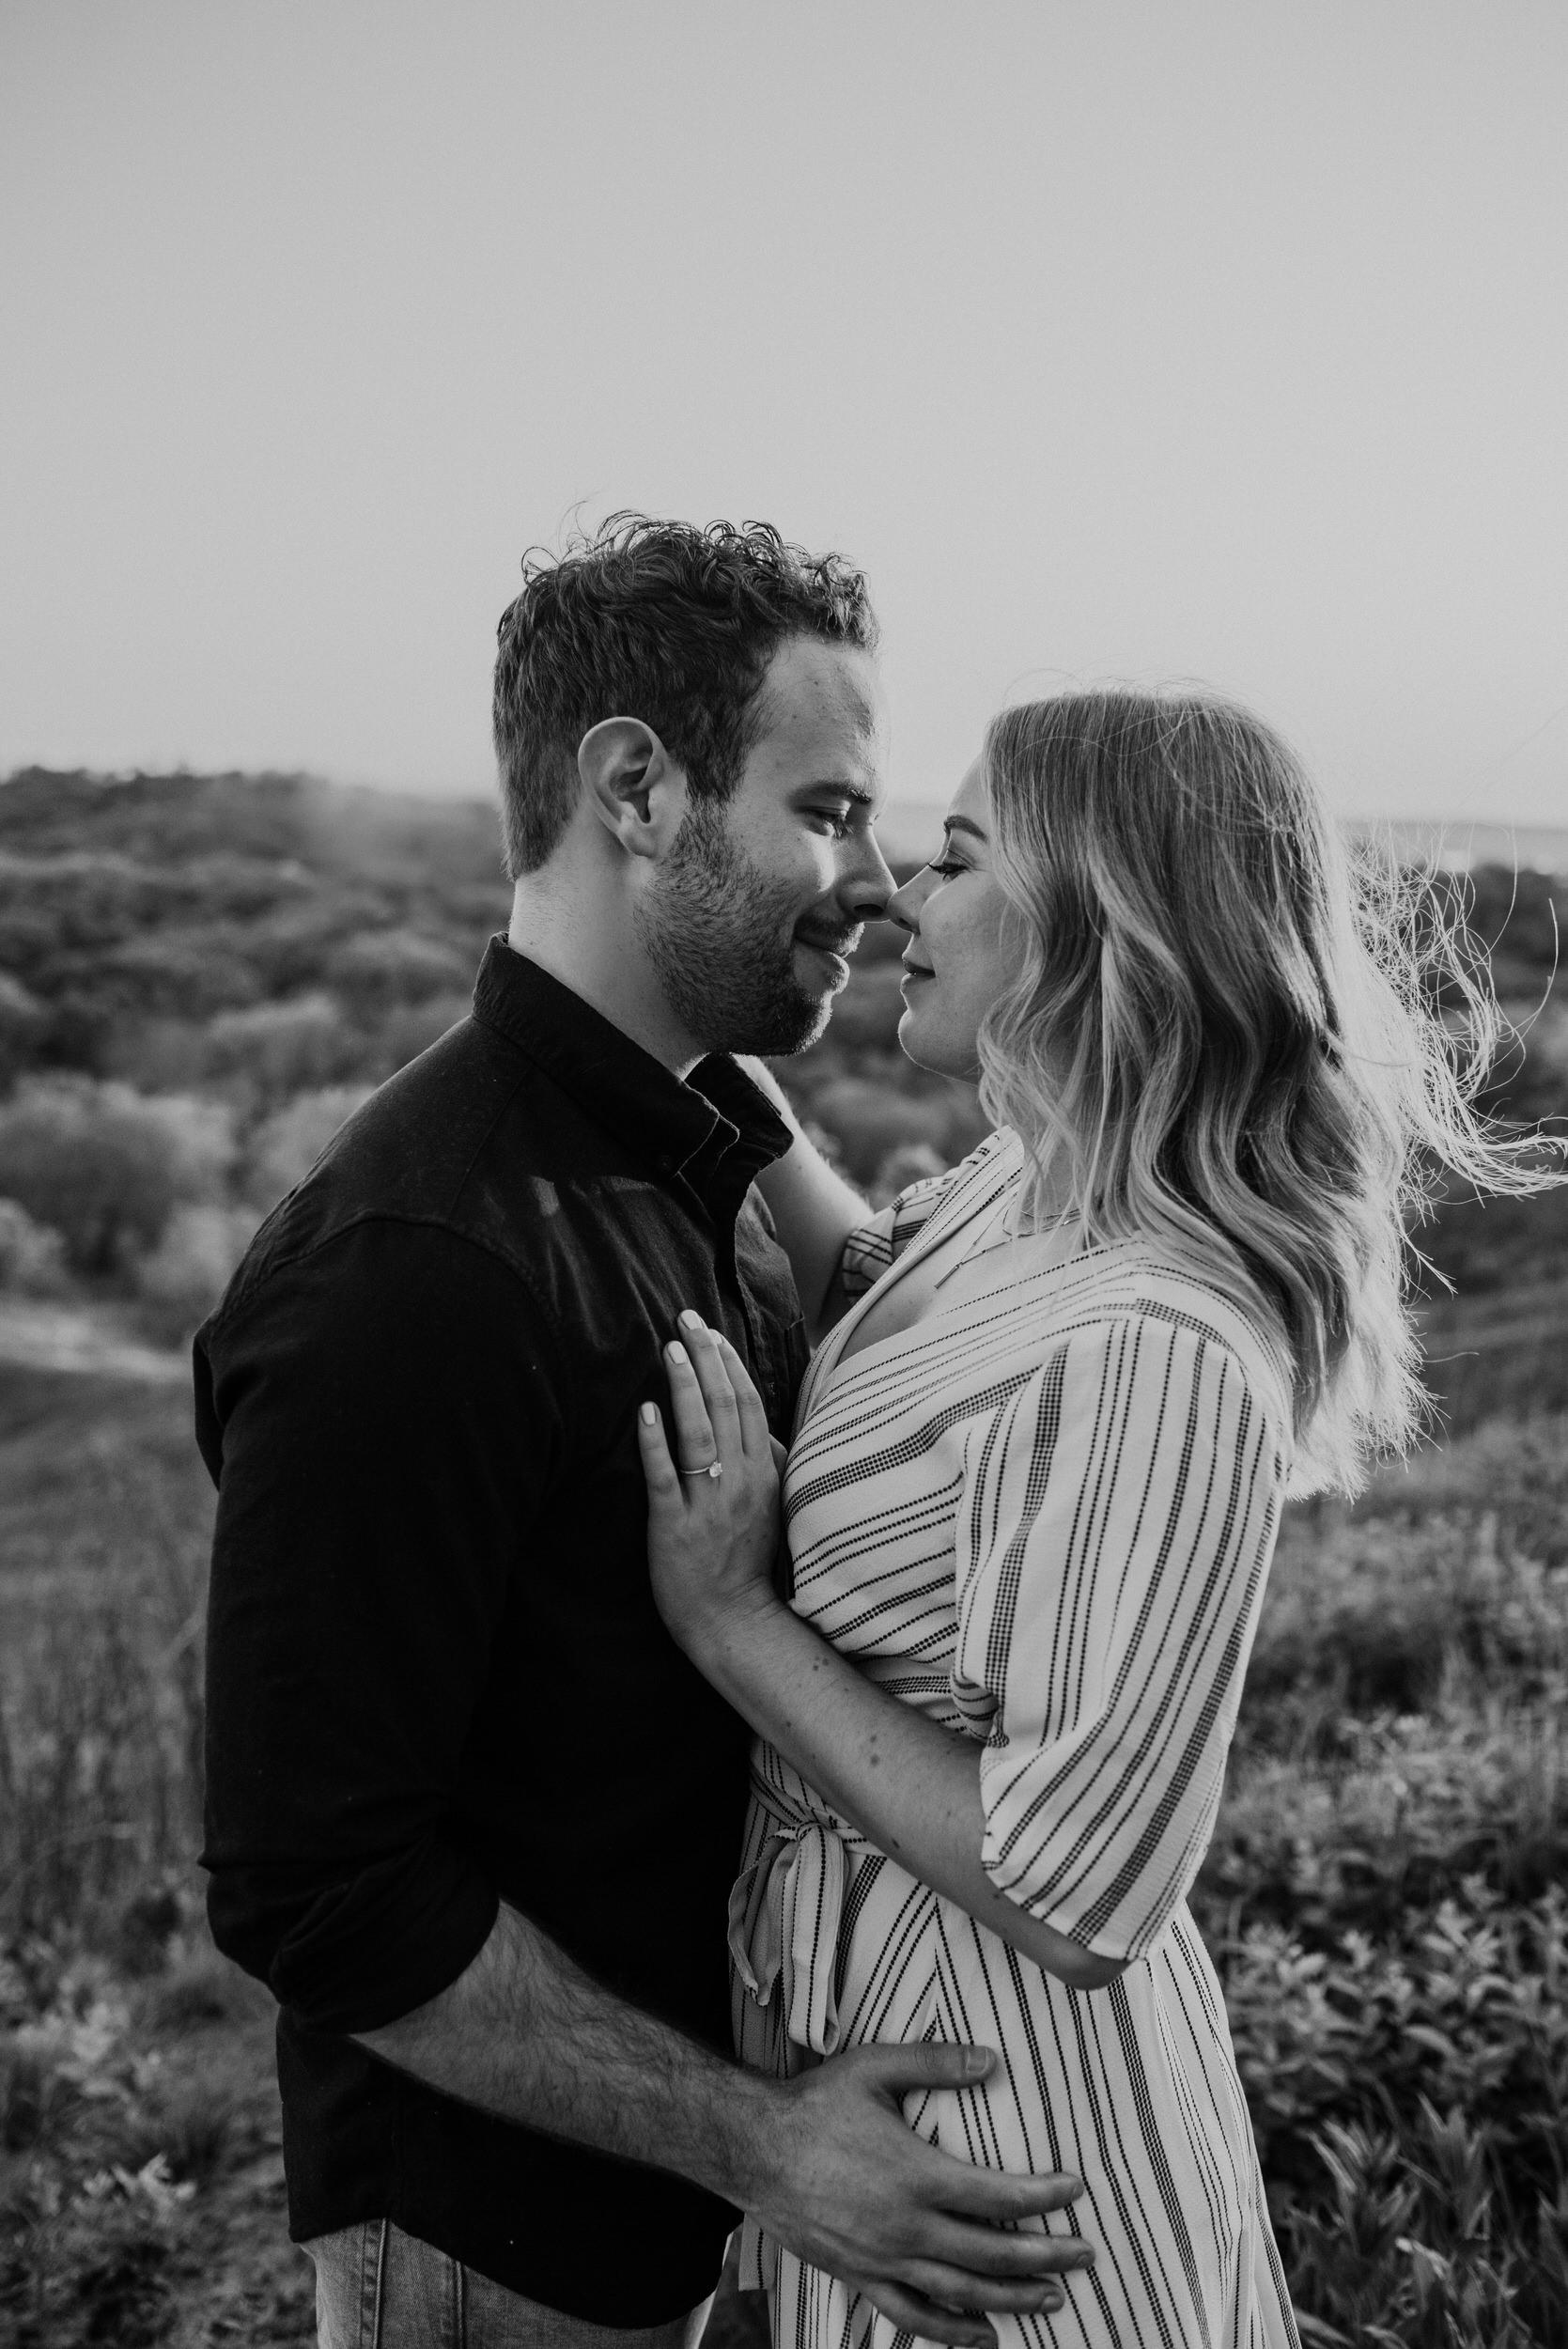 Omaha-Nebraska-Engagement-Session-Kaylie-Sirek-Photography-149.jpg